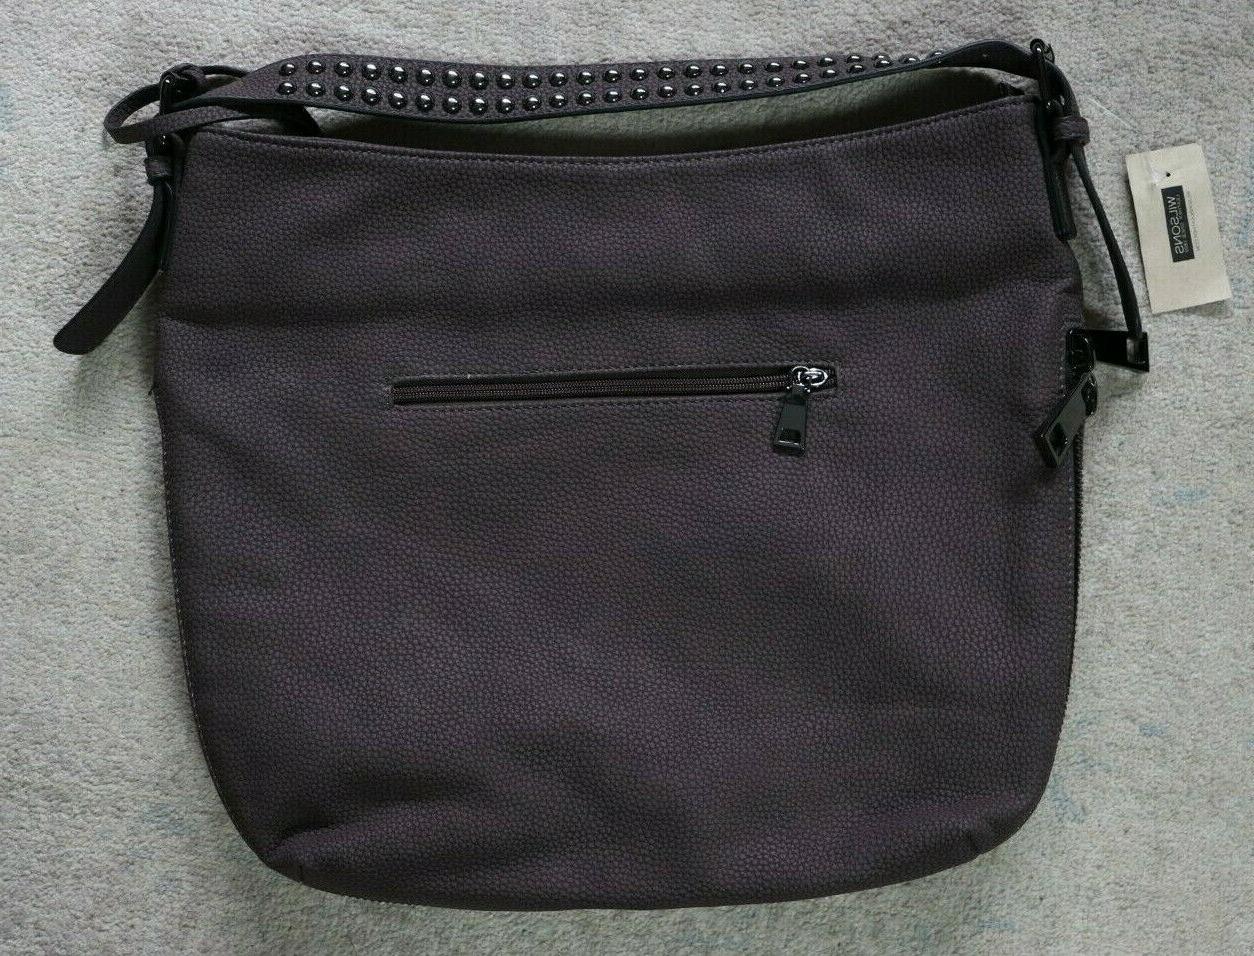 expandable tote bag medium size brand new